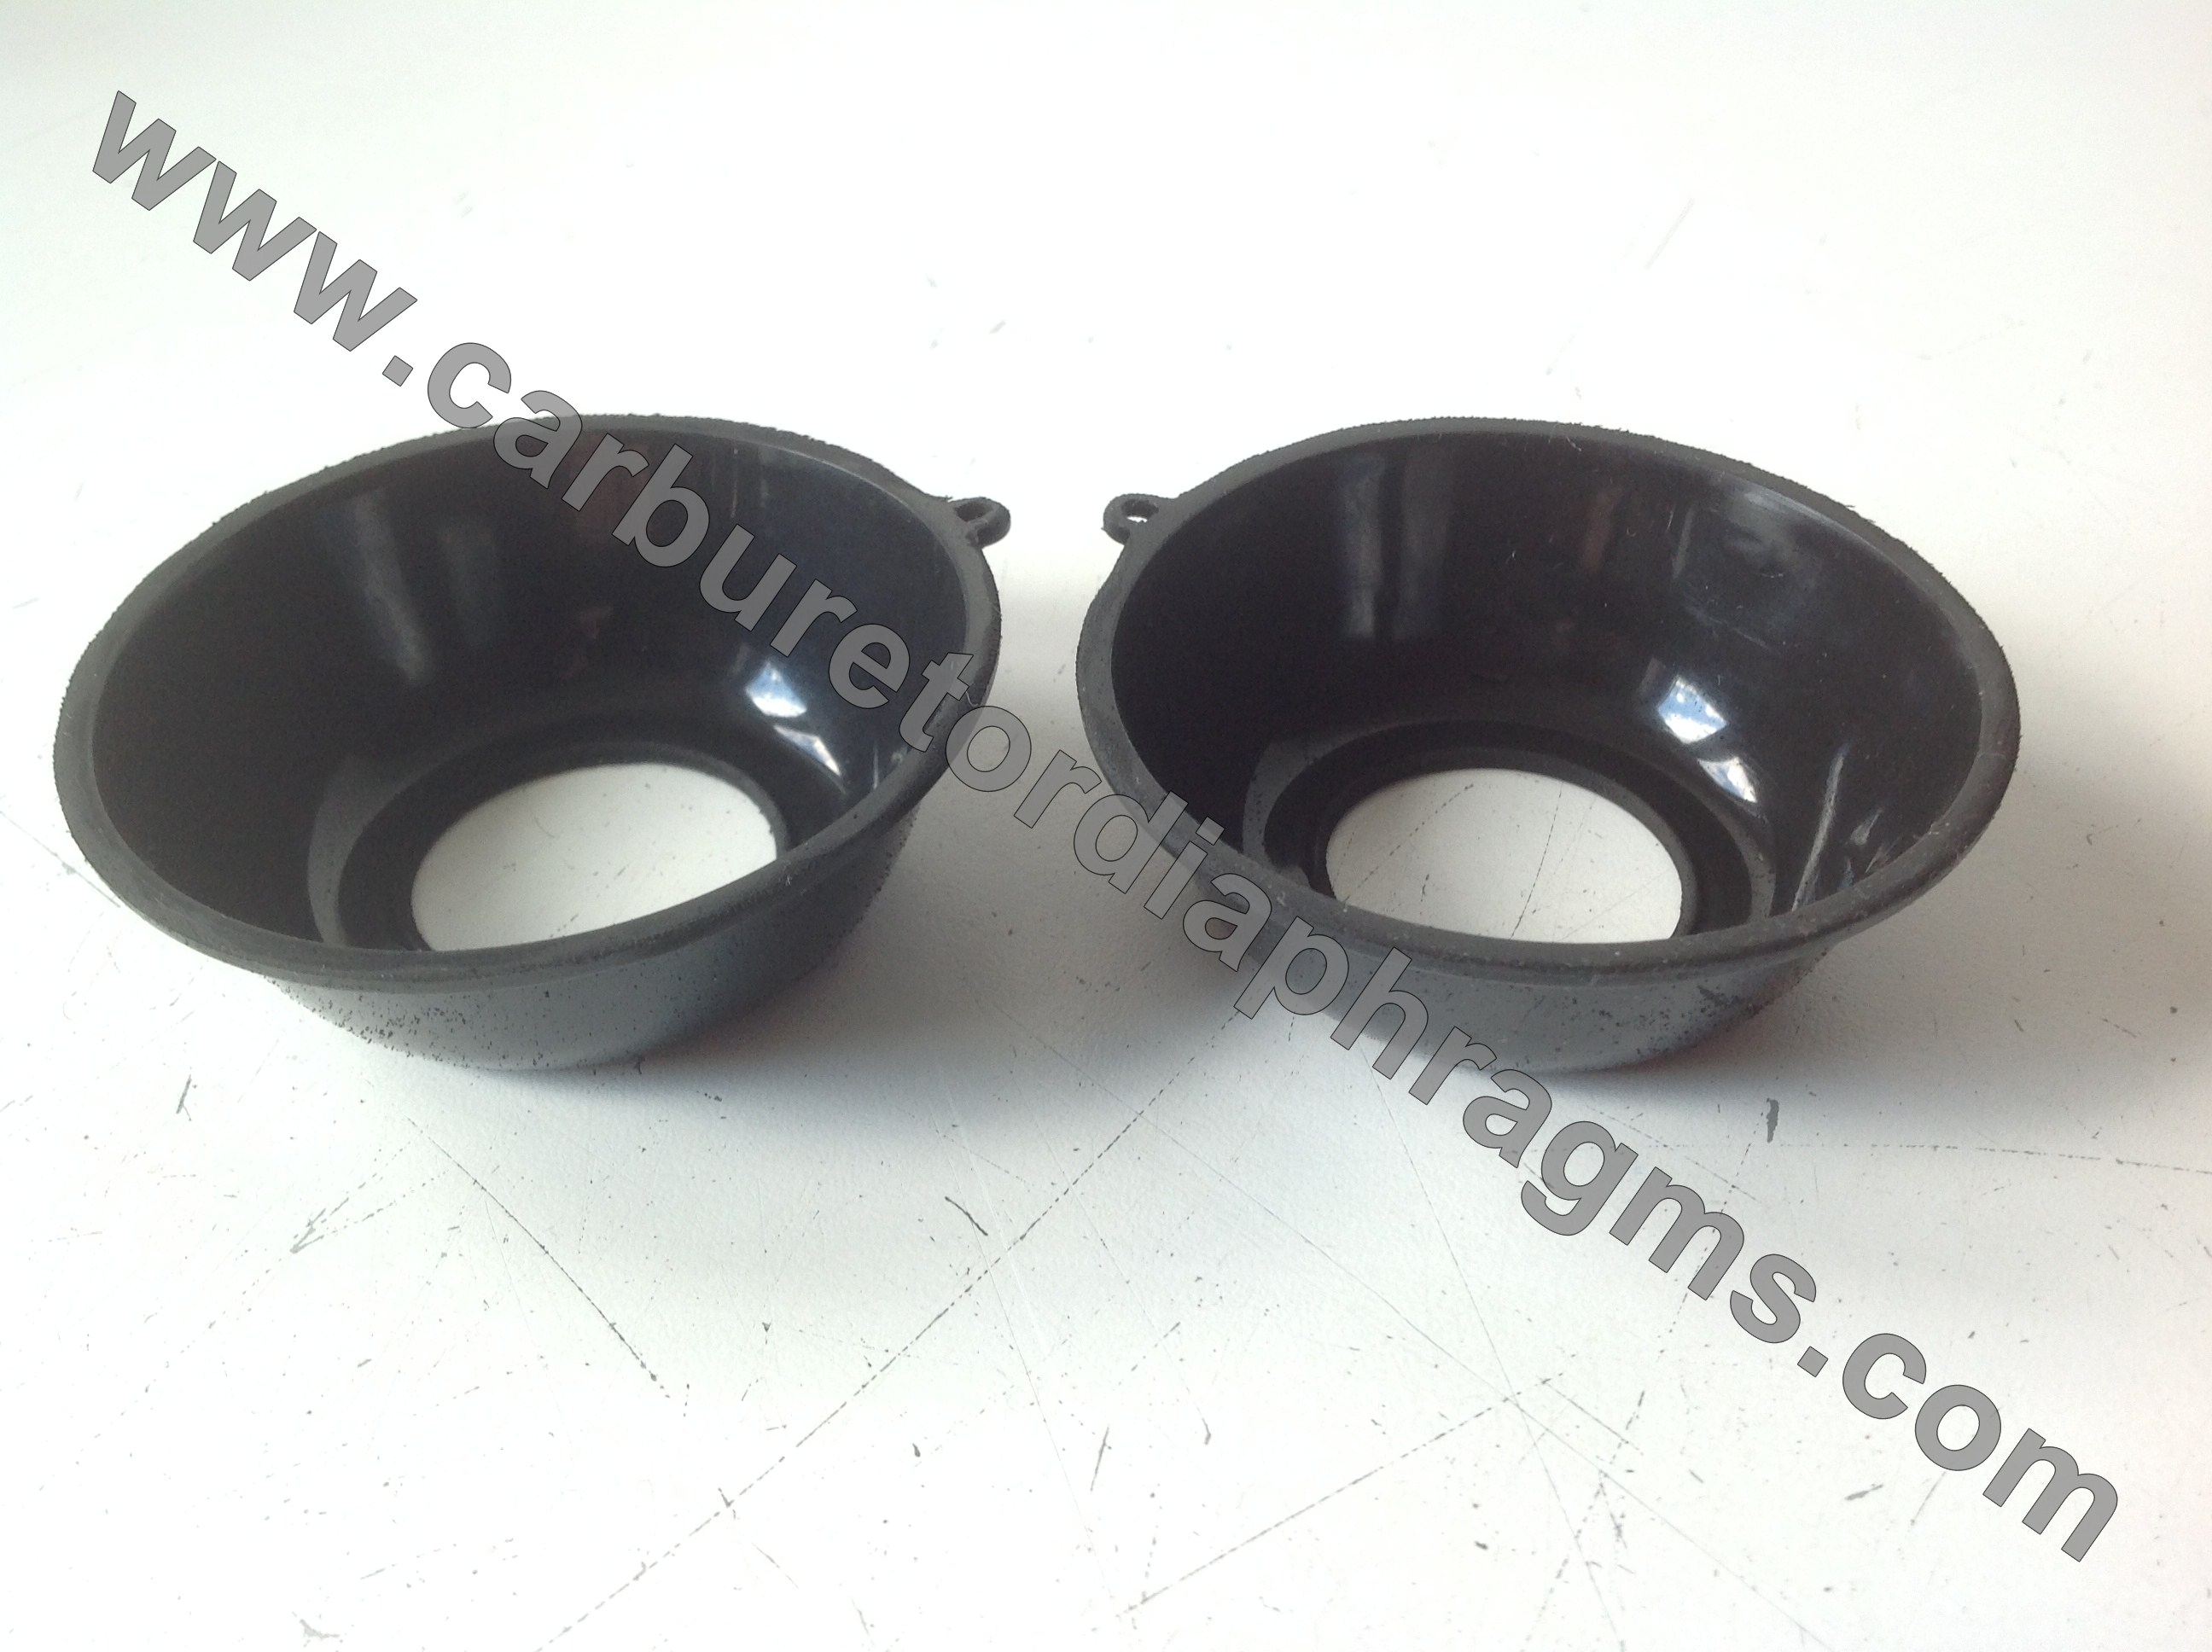 C/·T/·S Kit Guarnizione e diaframma per carburatore Tillotson DG-10HS per Husqvarna K950 Partner K650 K700 K850 K1200 Confezione da 2